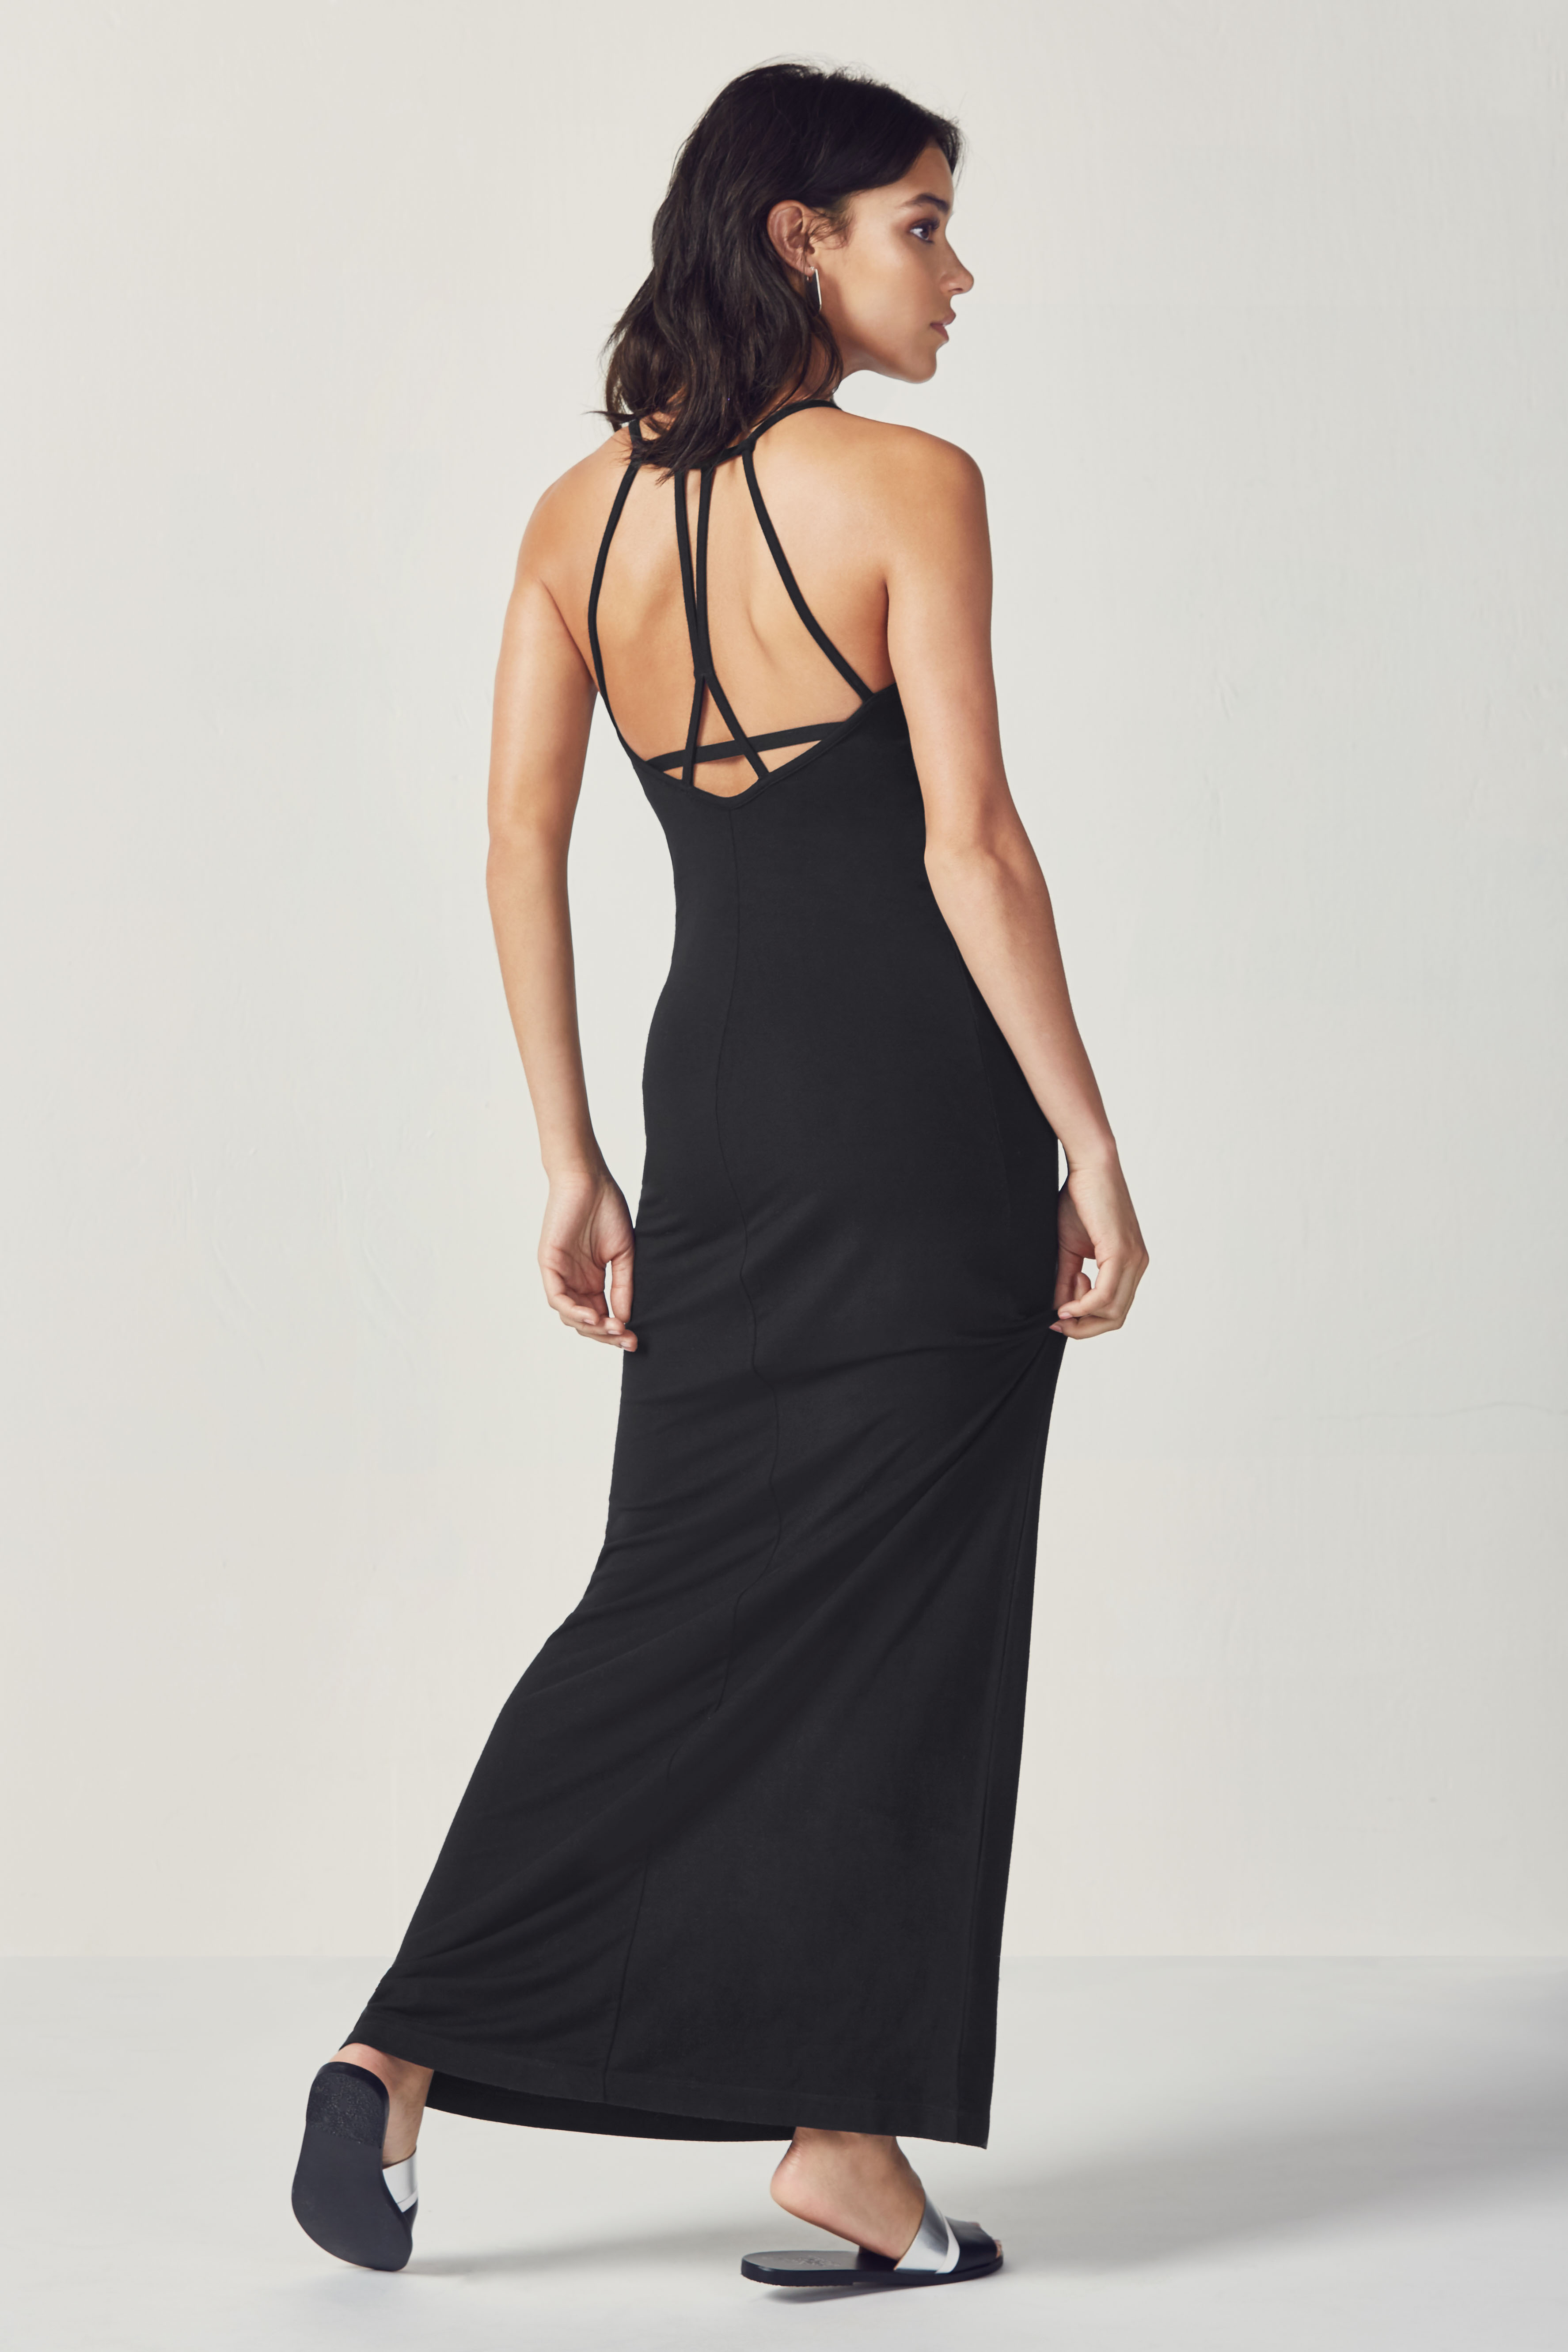 Fabletics Evelyn Maxi Dress Womens Black Size XL